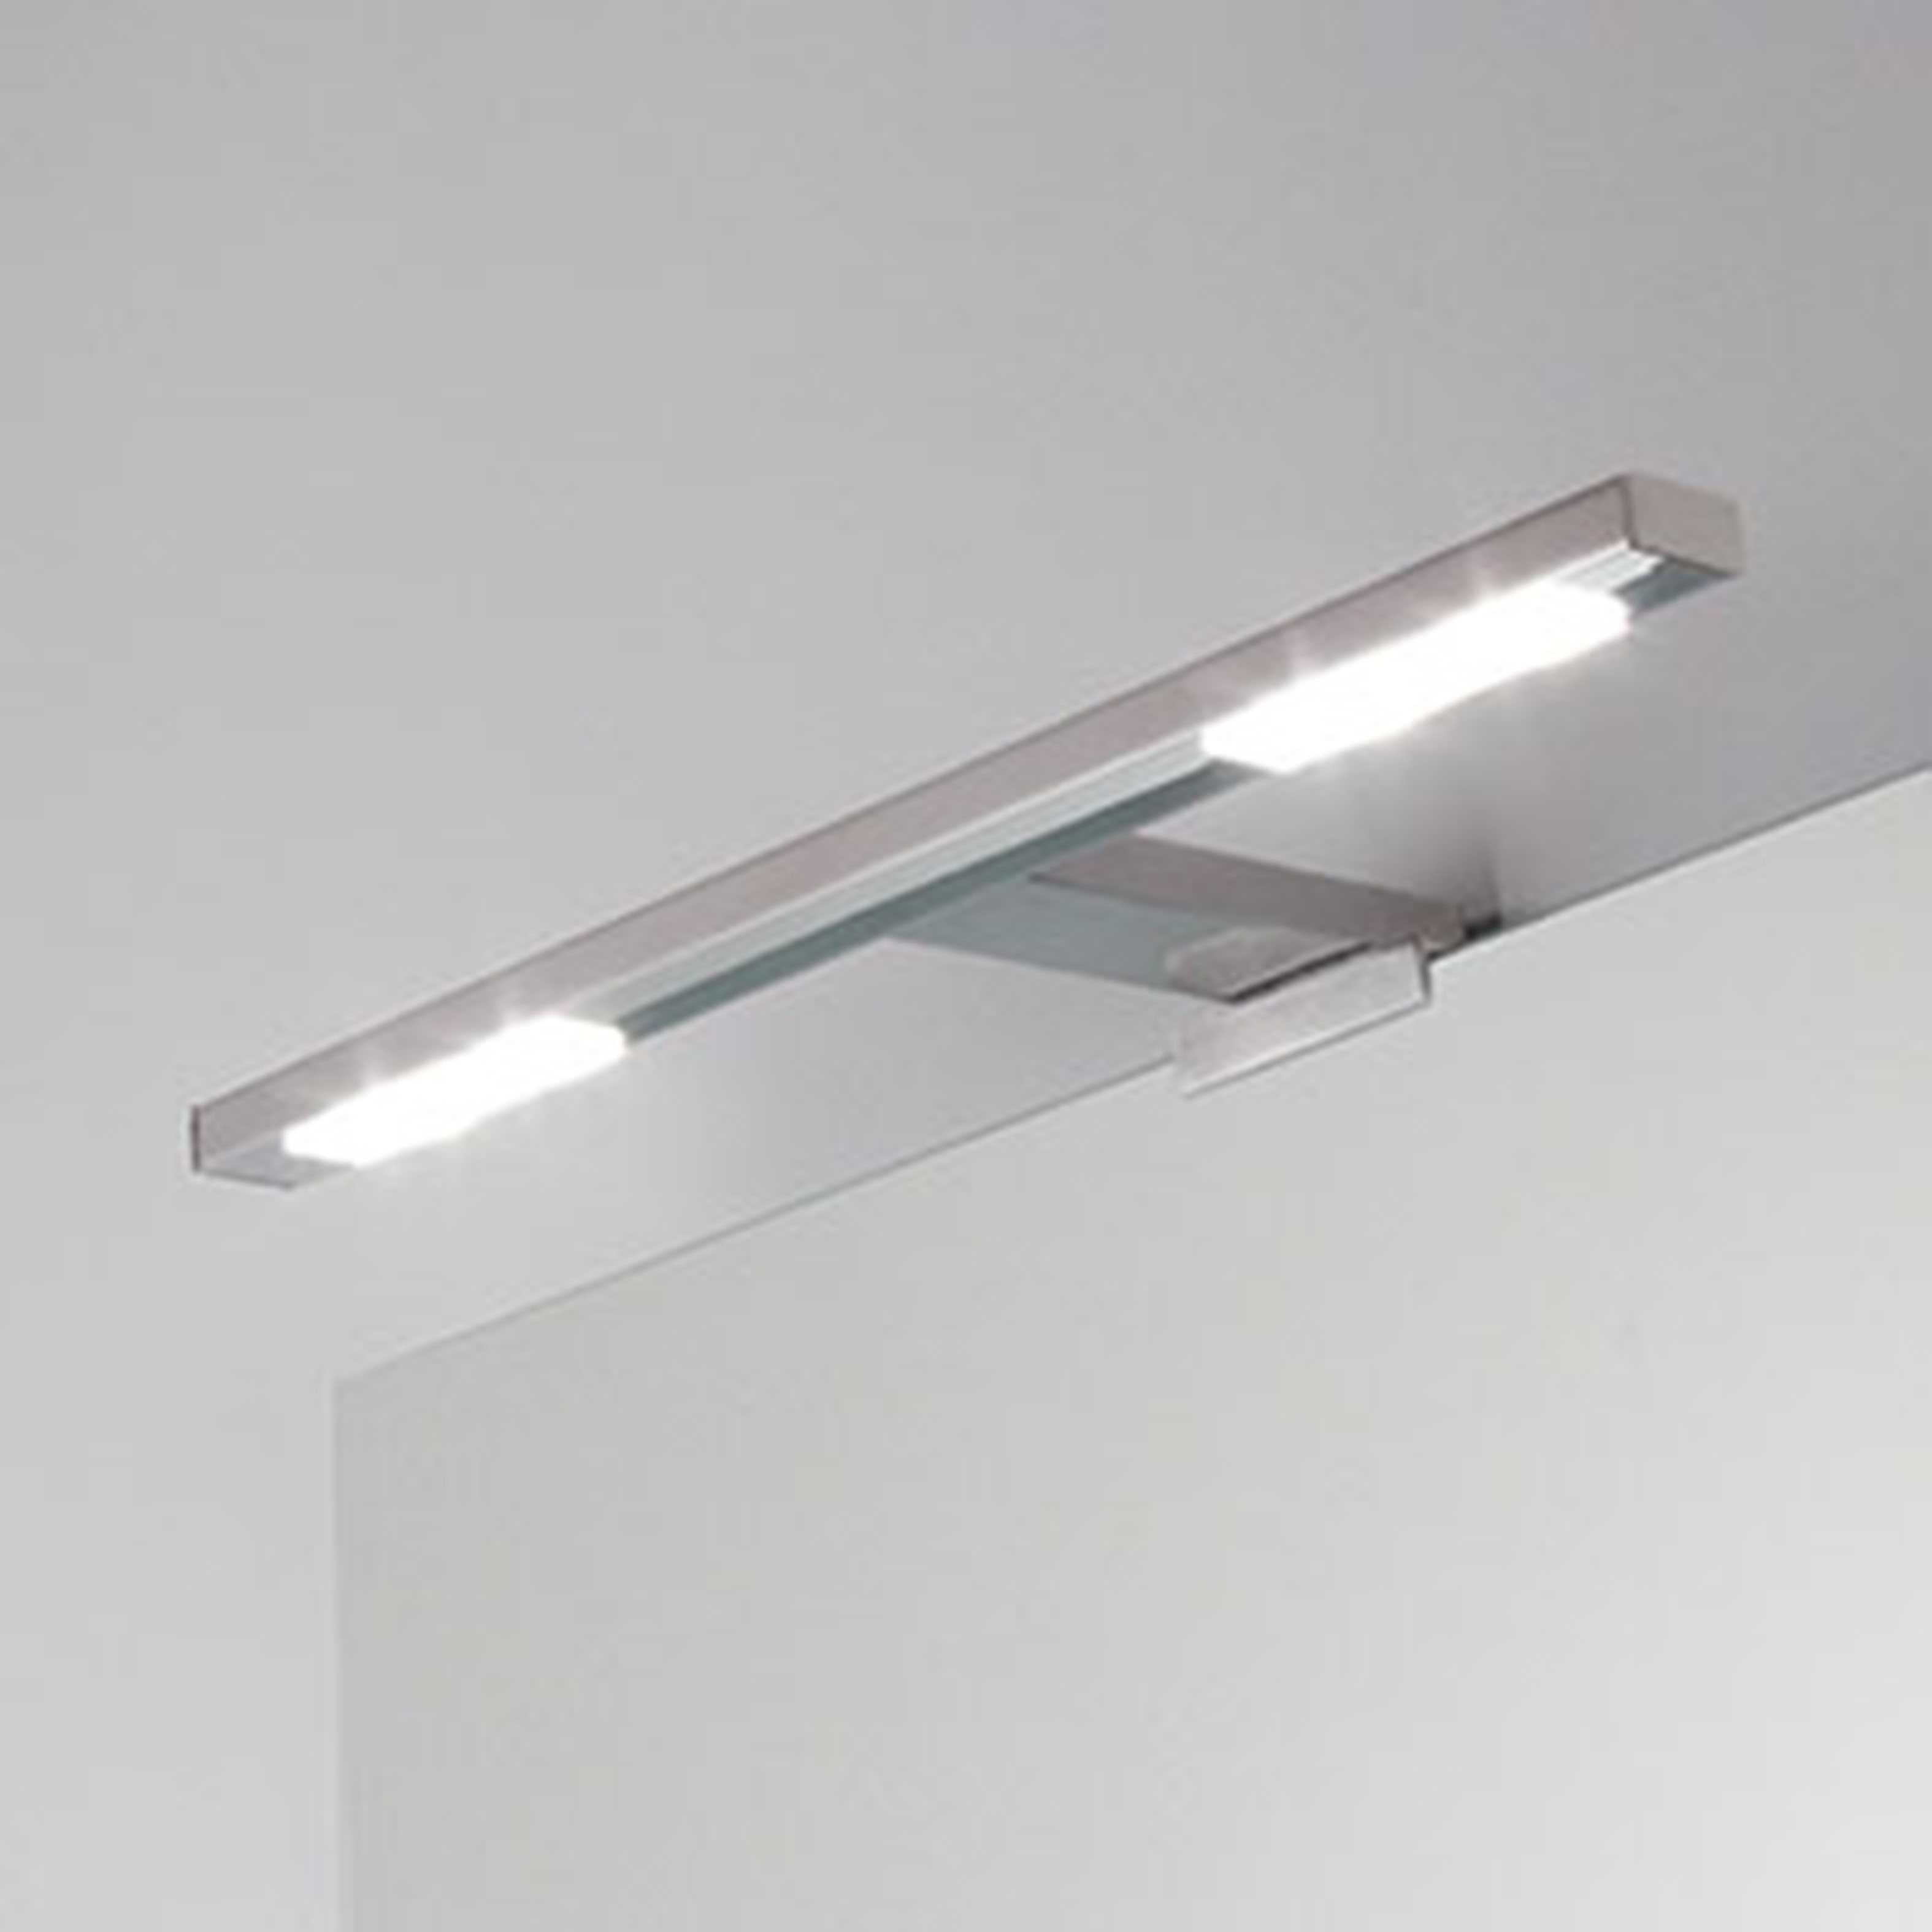 Lampada con luce Led di koh-i-noor art. 7906